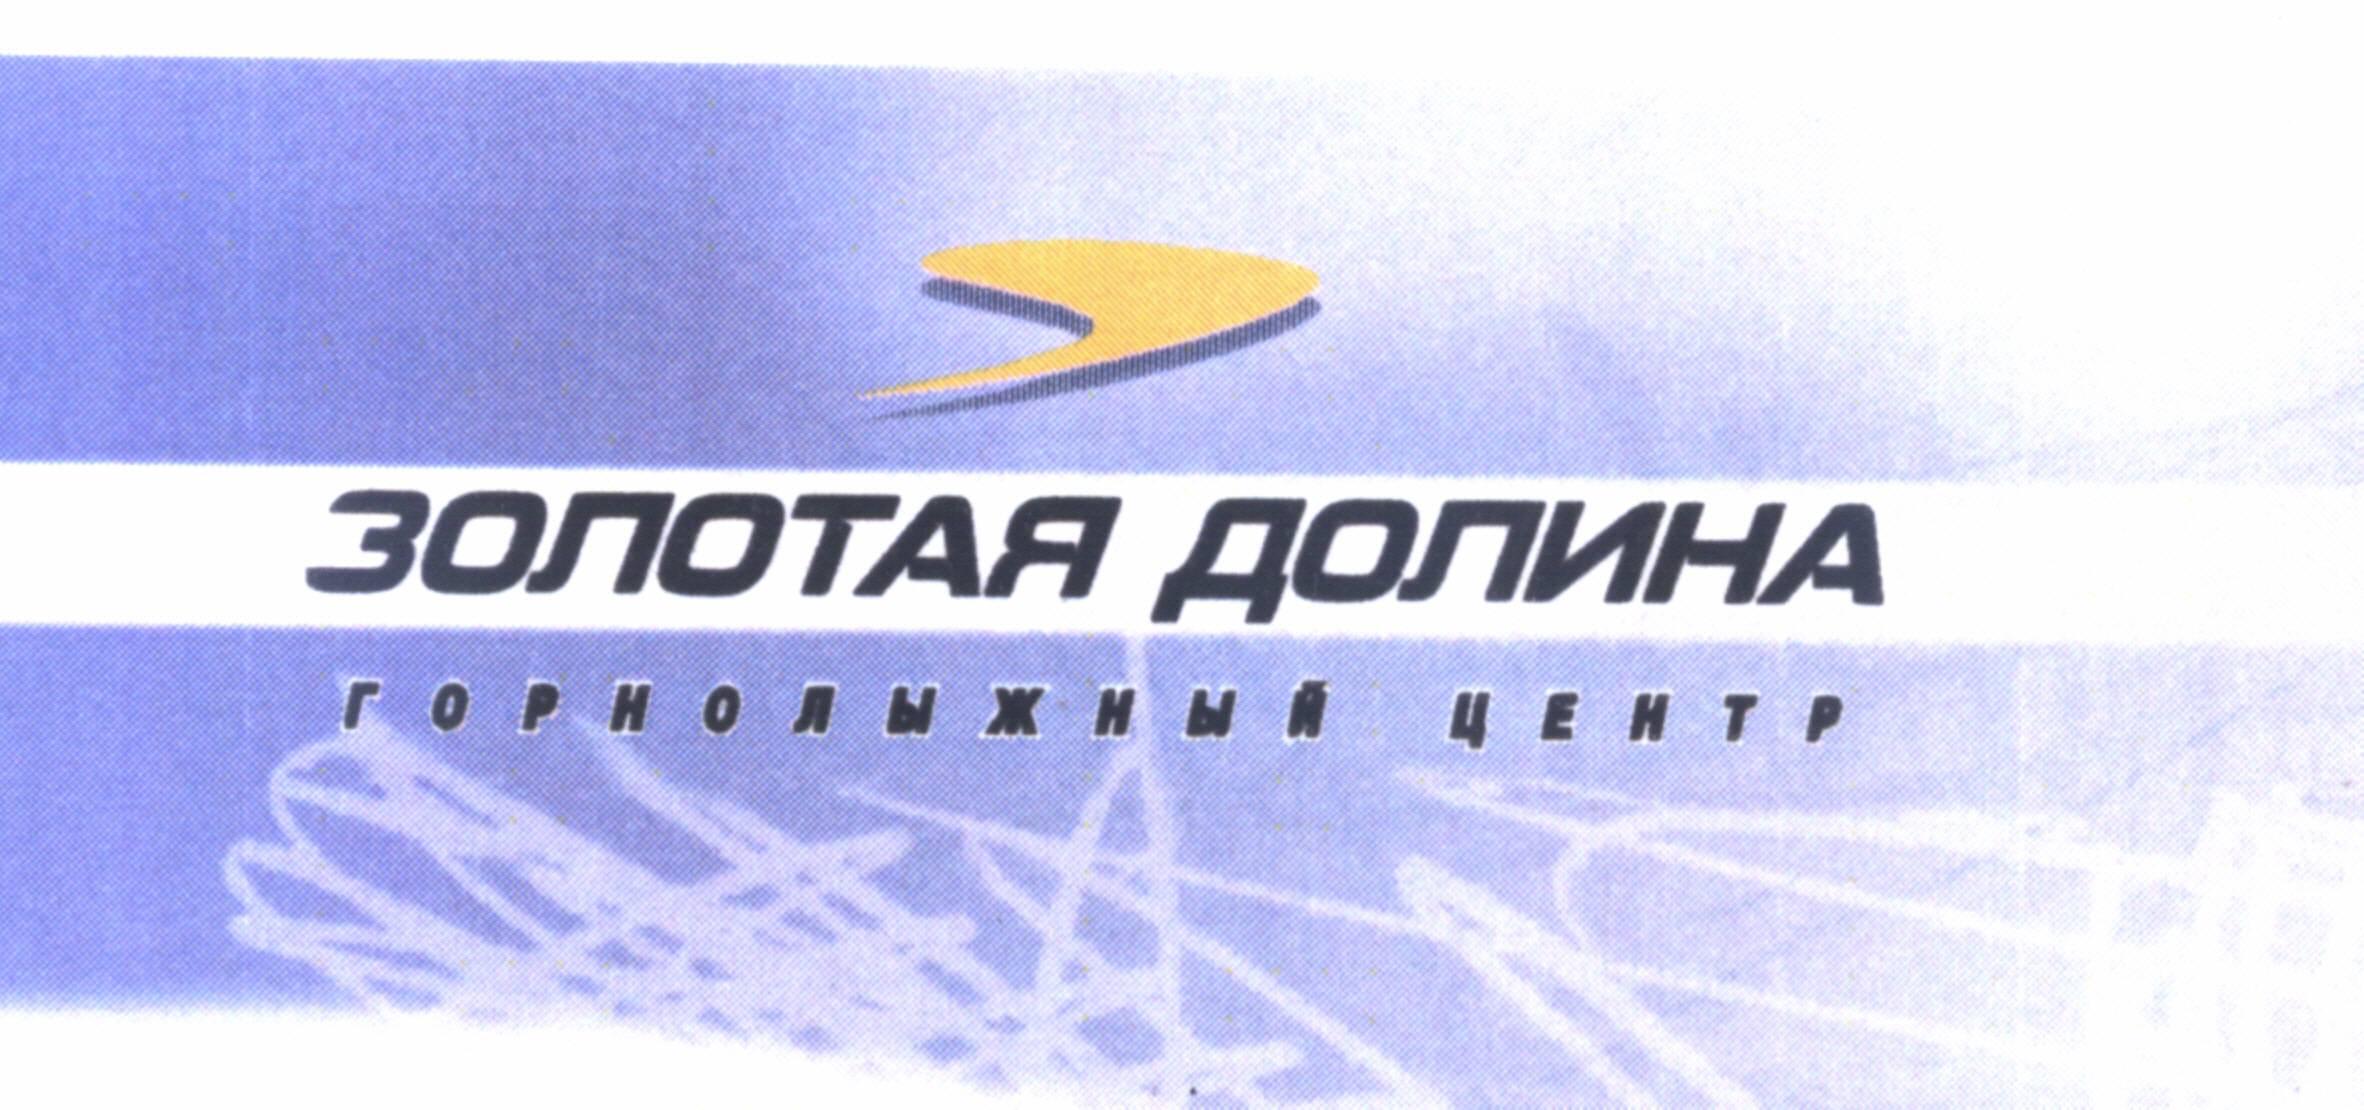 Суонтака (горнолыжный центр